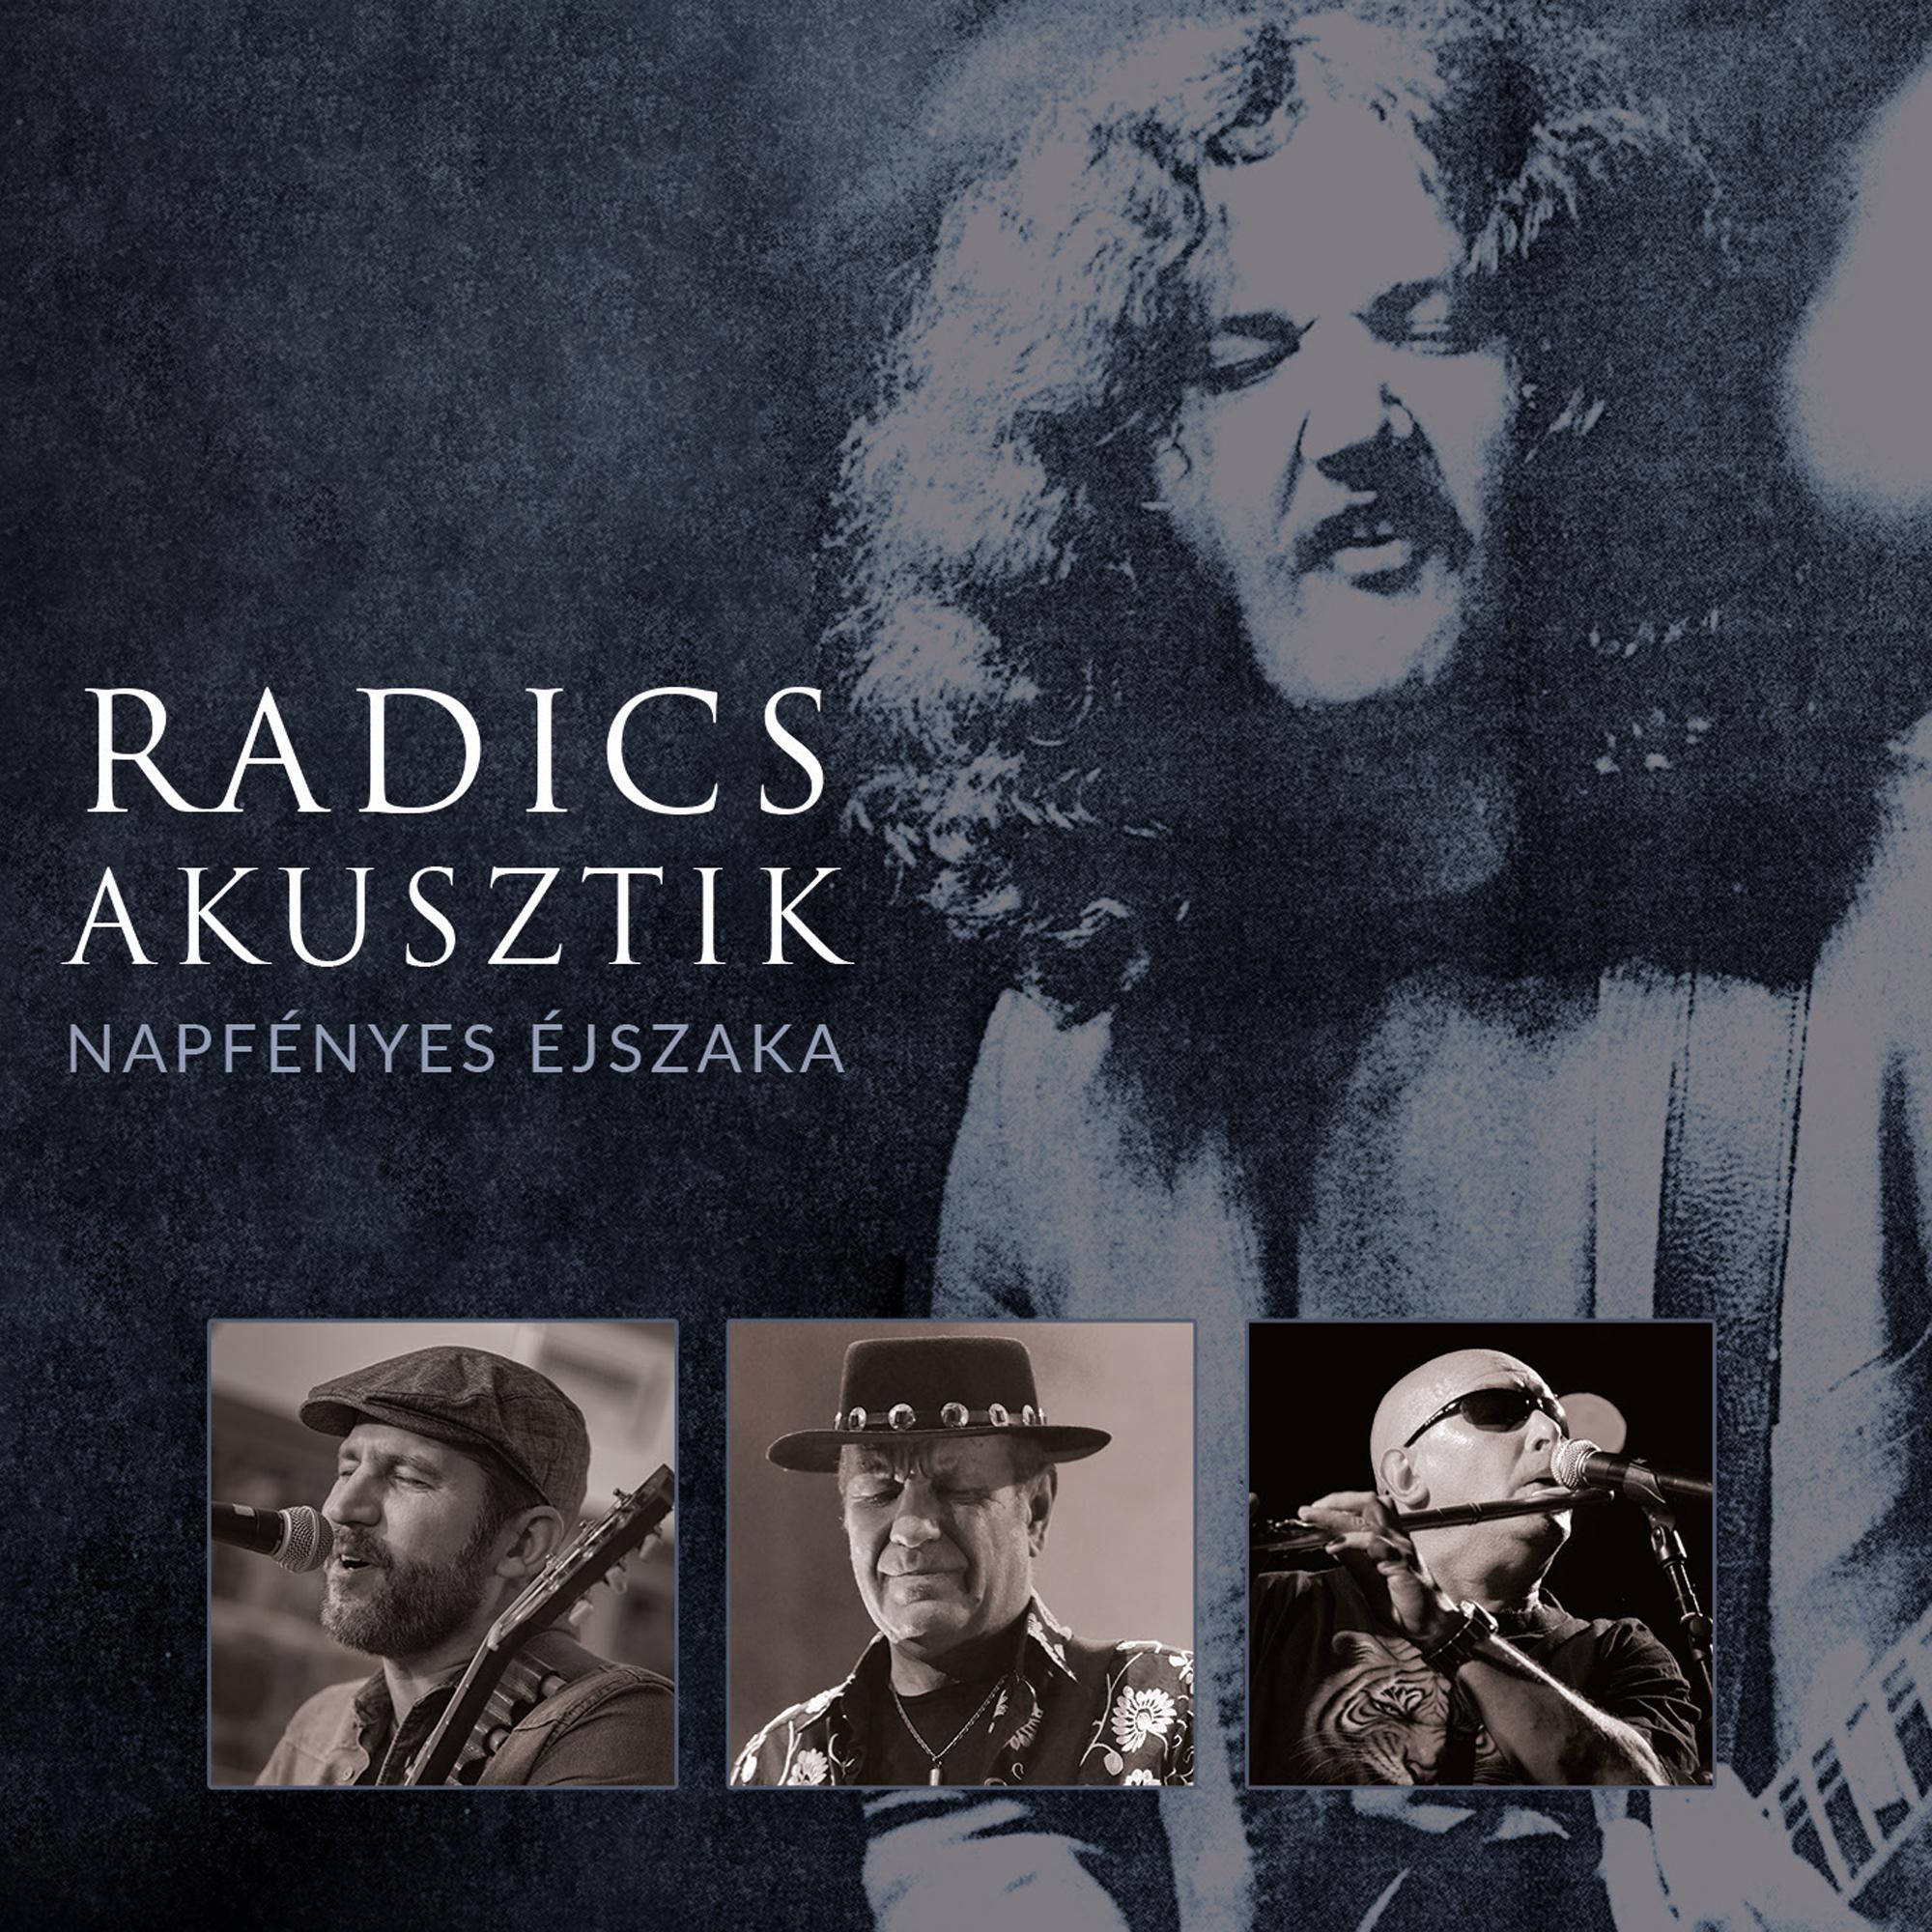 gr149_radics_akusztik_napfenyes_ejszaka_cover_2000.jpg